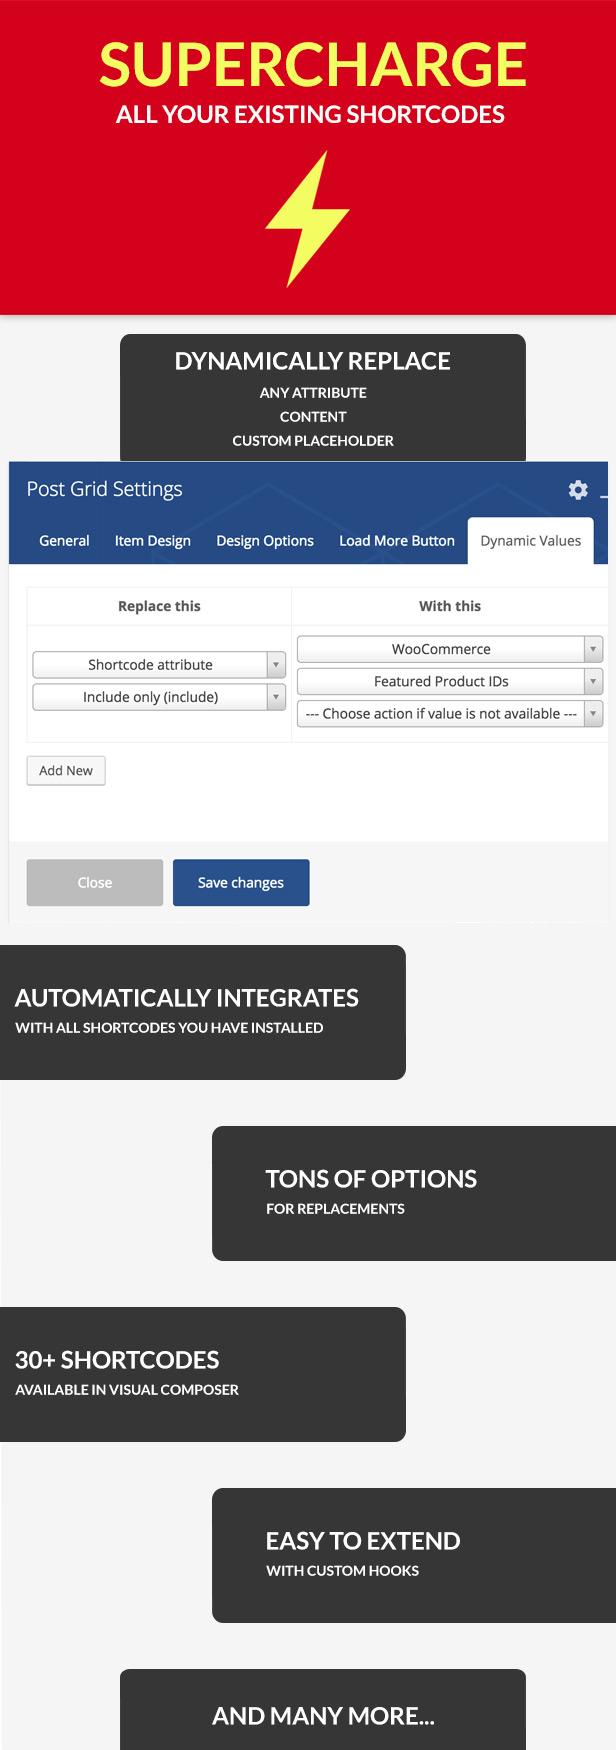 Custom Page Templates: New Way of Creating Custom Templates in WordPress - 4